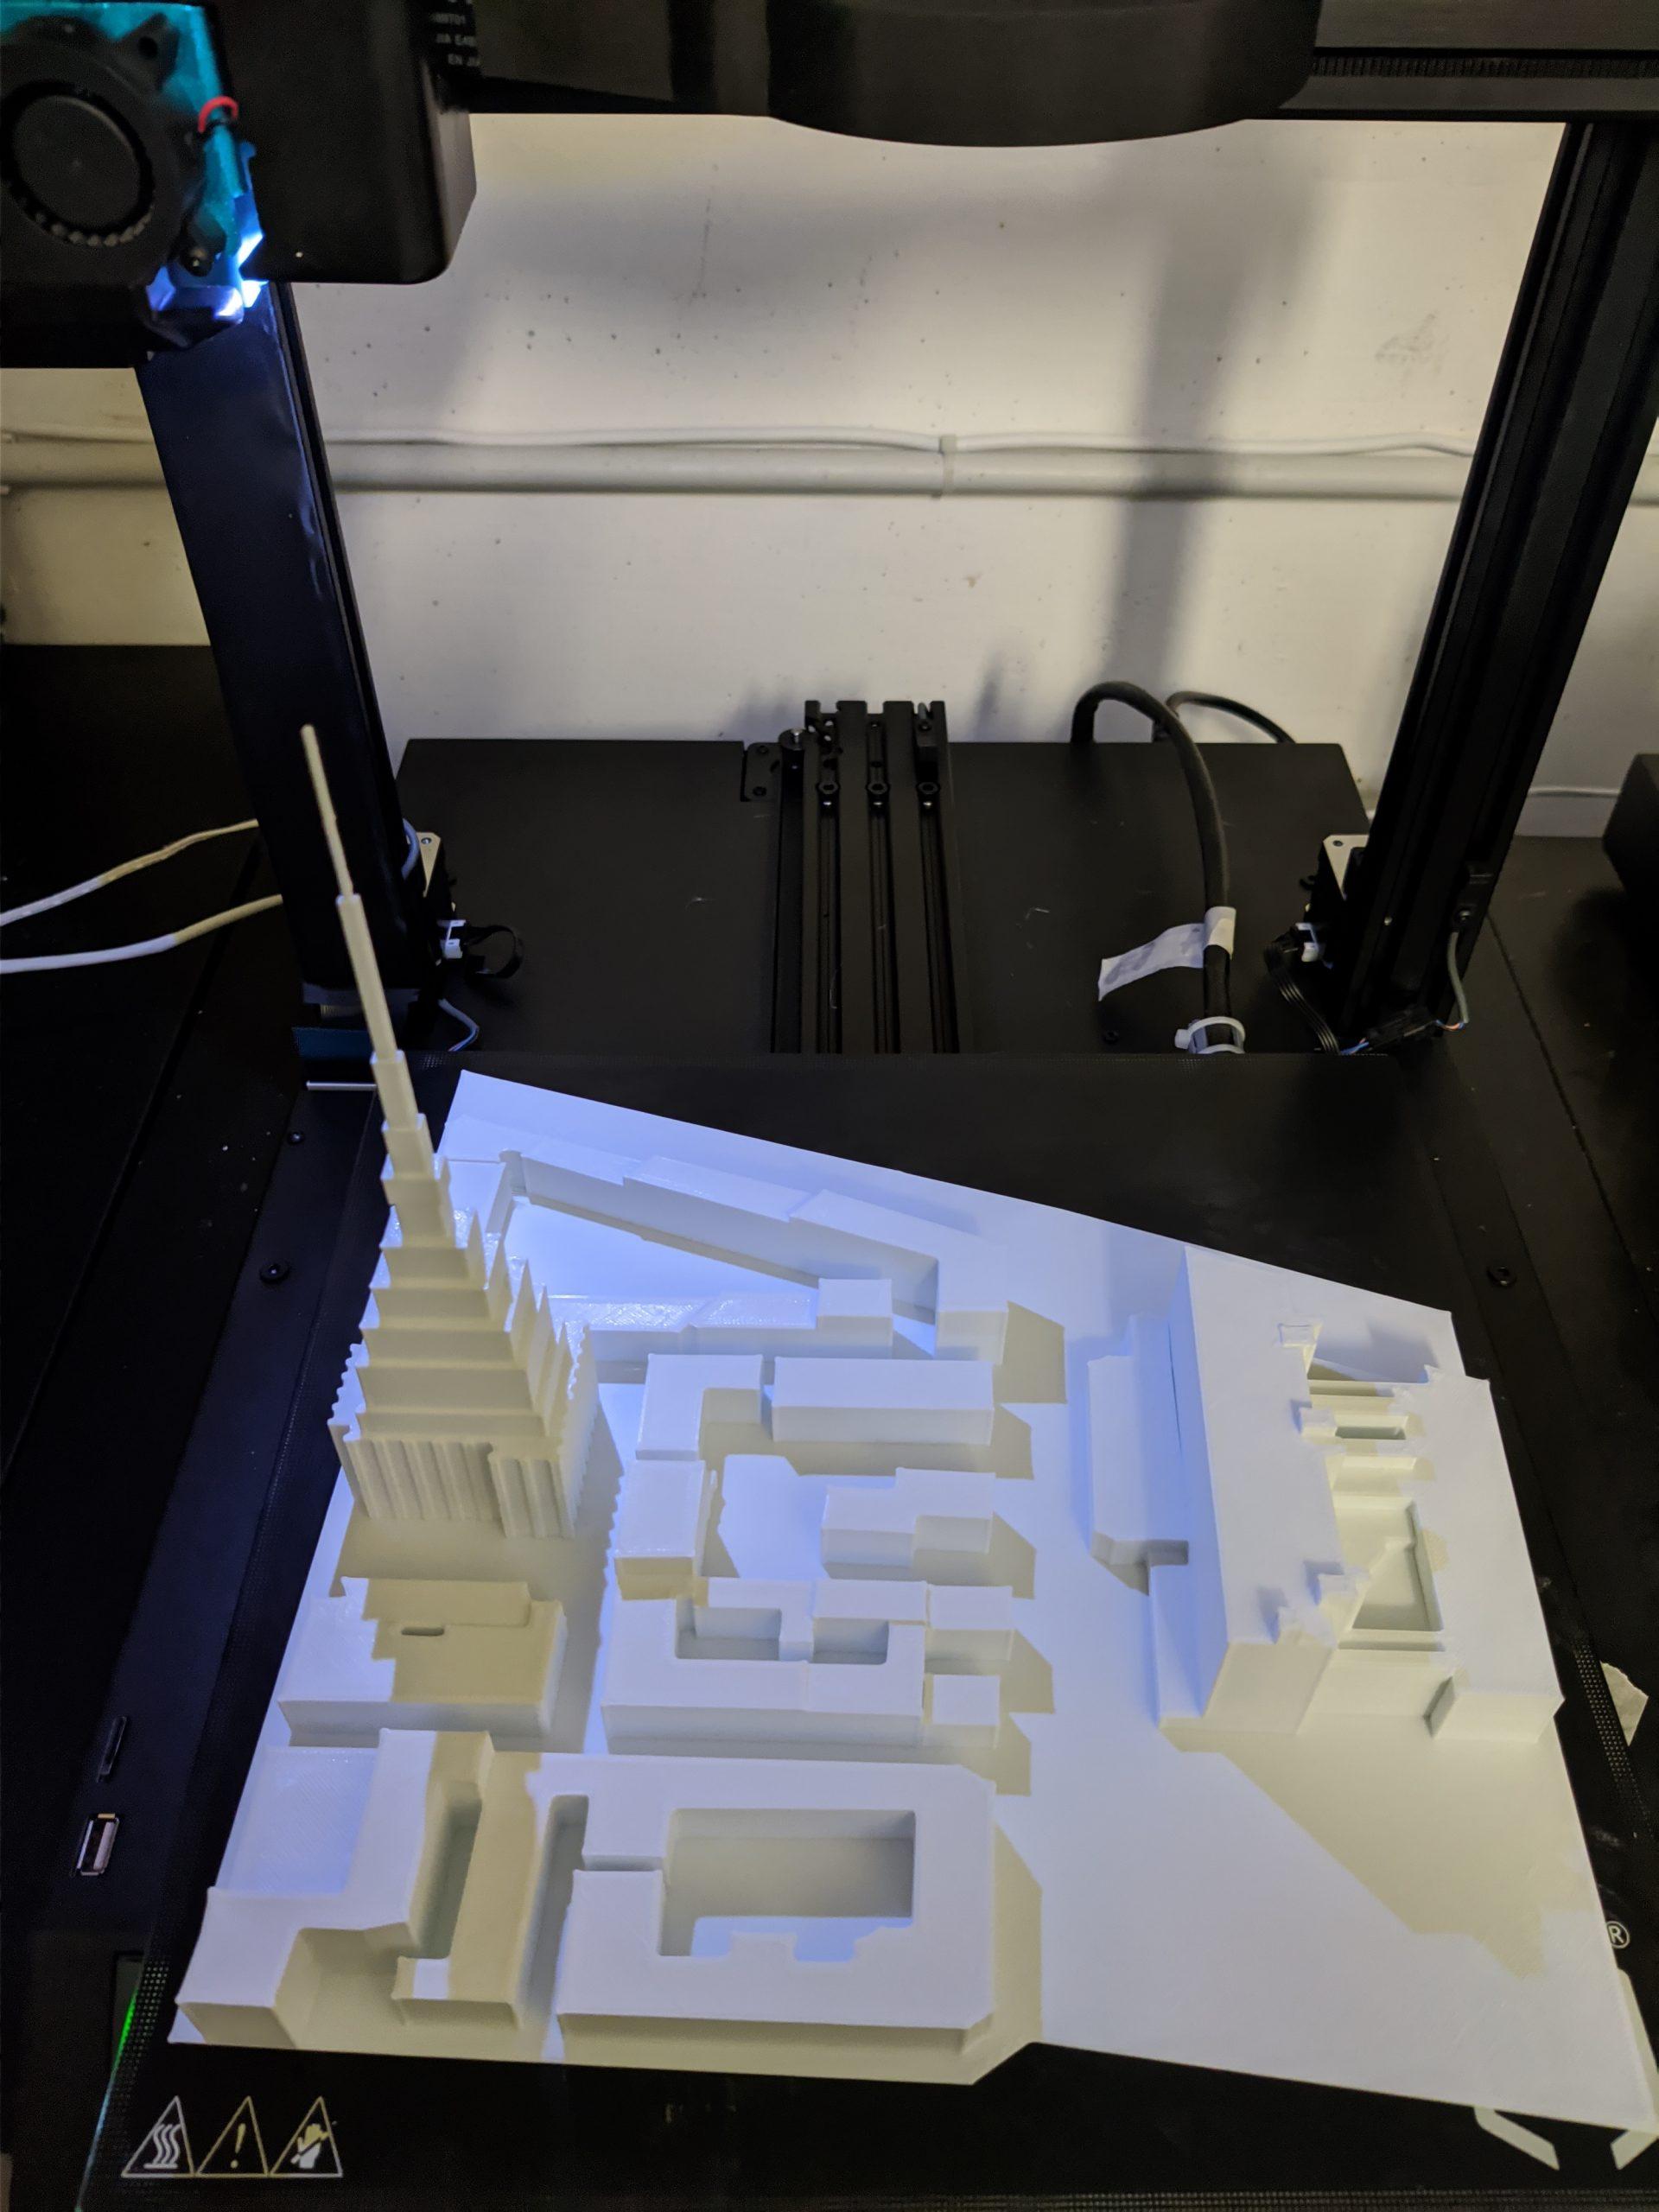 Mole Antonelliana Stampa 3D - KreaItaly, Stampa 3d - Stampanti 3d Marche - Stampanti 3D prezzi - Aziende stampa 3d